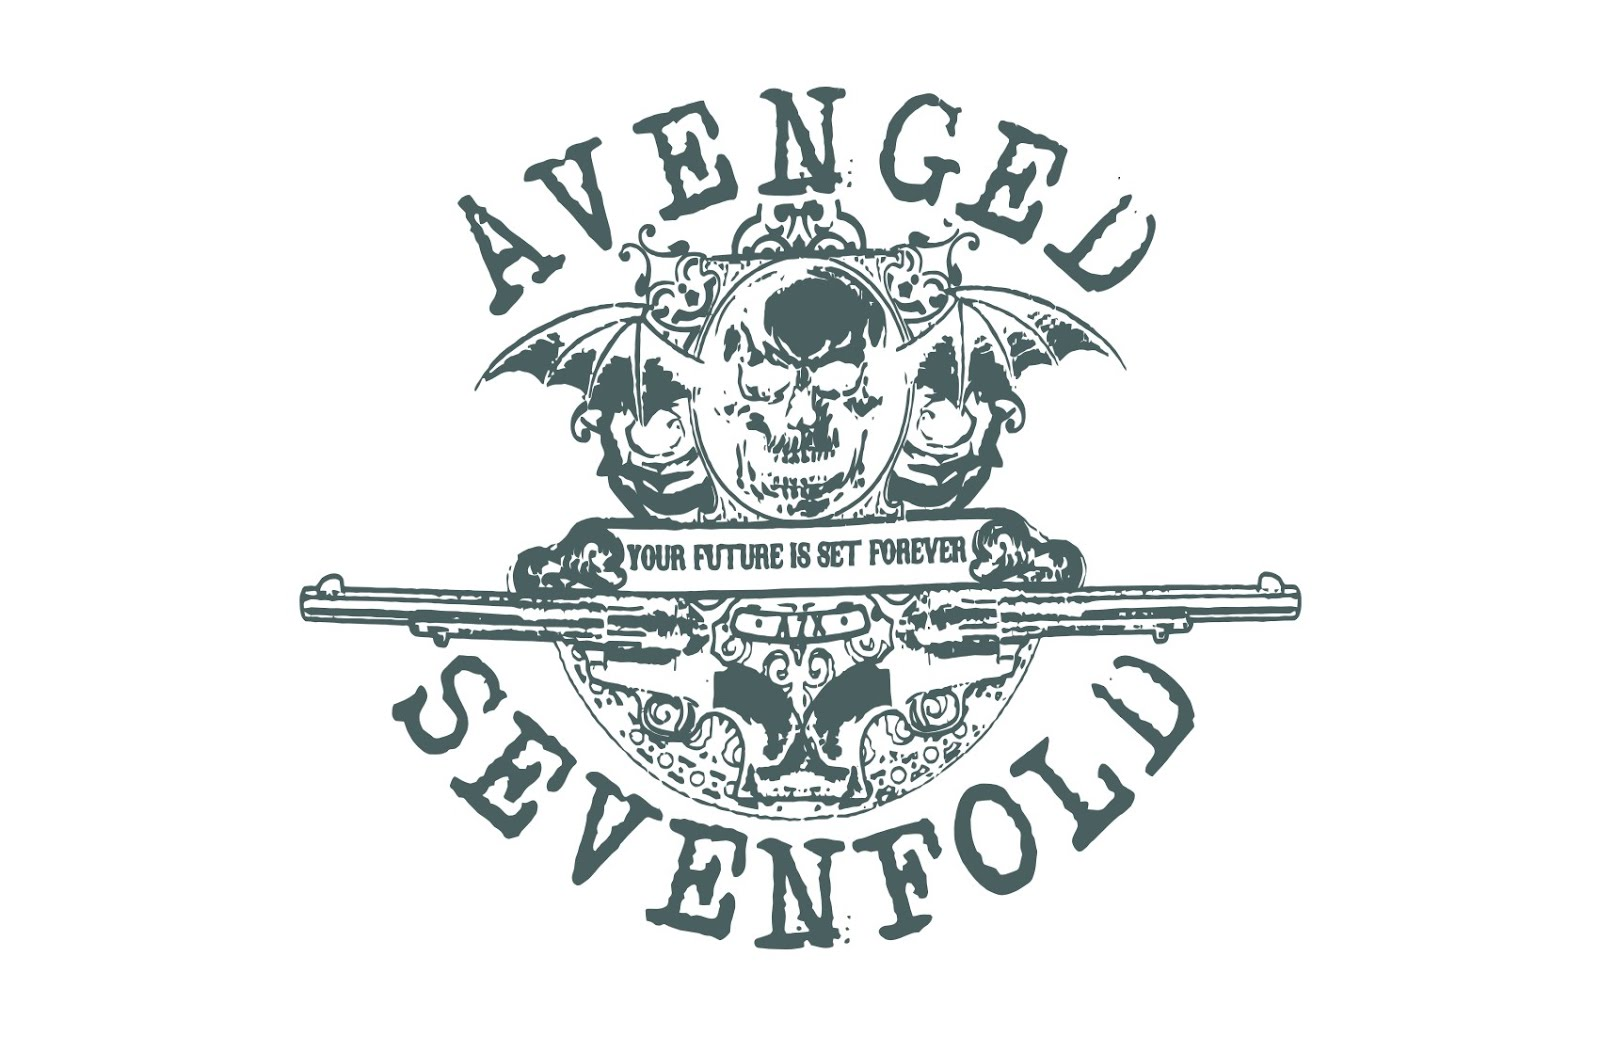 Av av avenged sevenfold tattoo designs - Description Tattoo Avenged Sevenfold